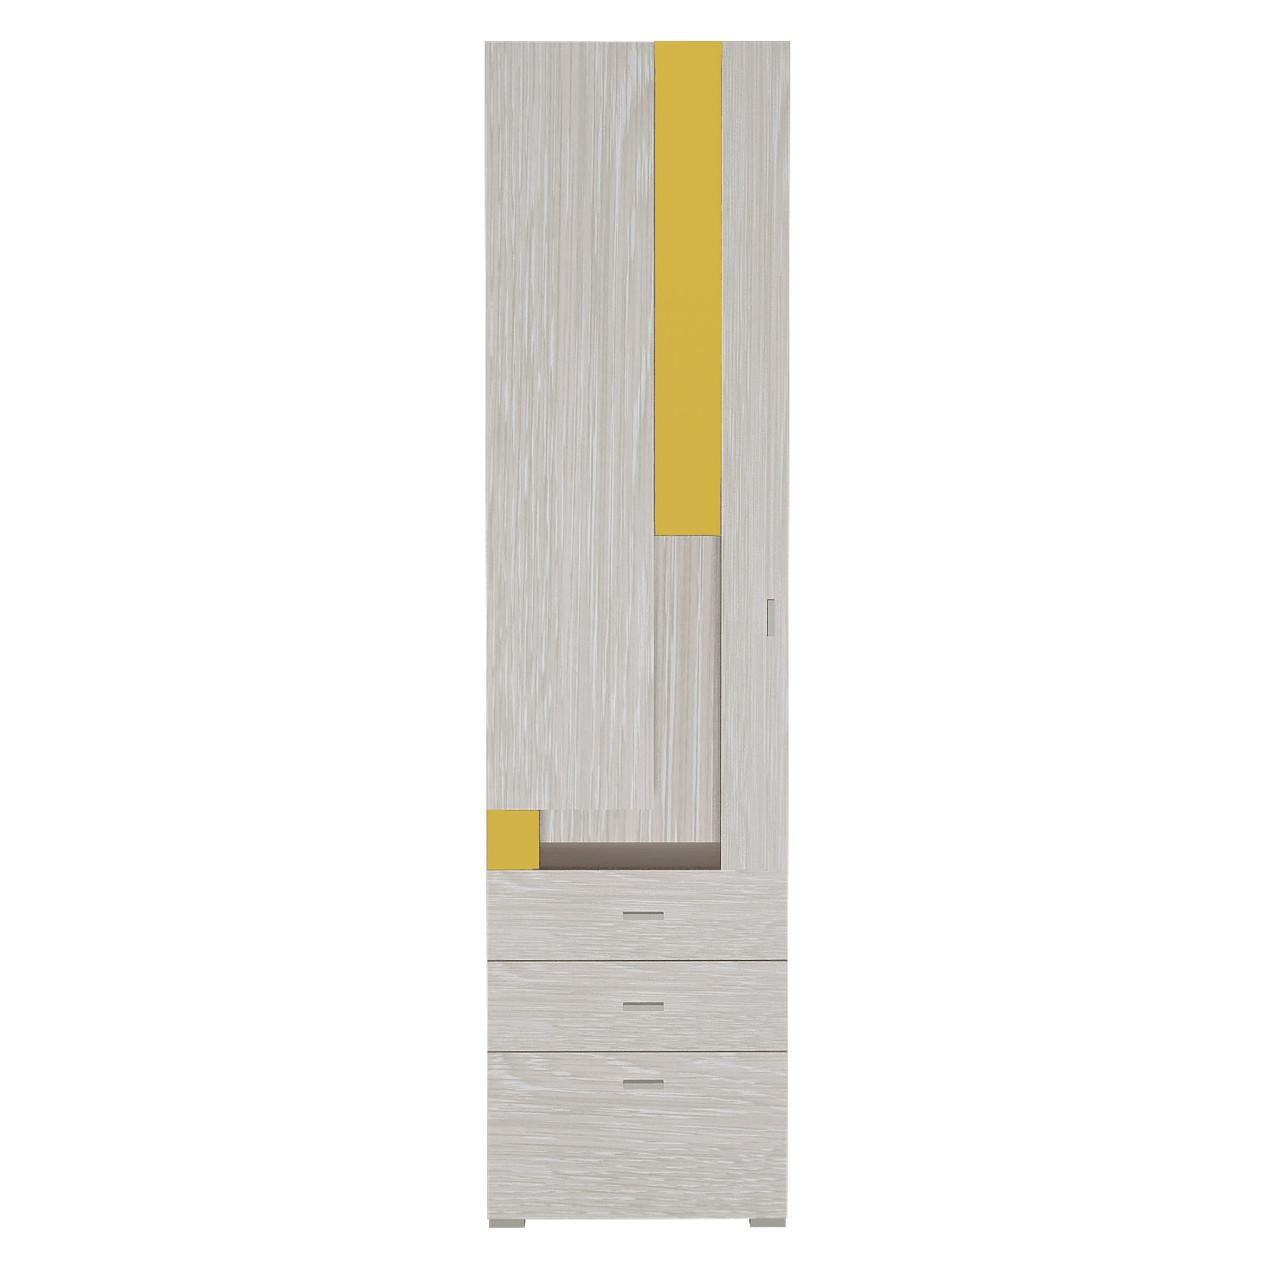 Шафа в дитячу кімнату з ДСП/МДФ AXEL Е Blonski 1 дверна атланта+жовтий